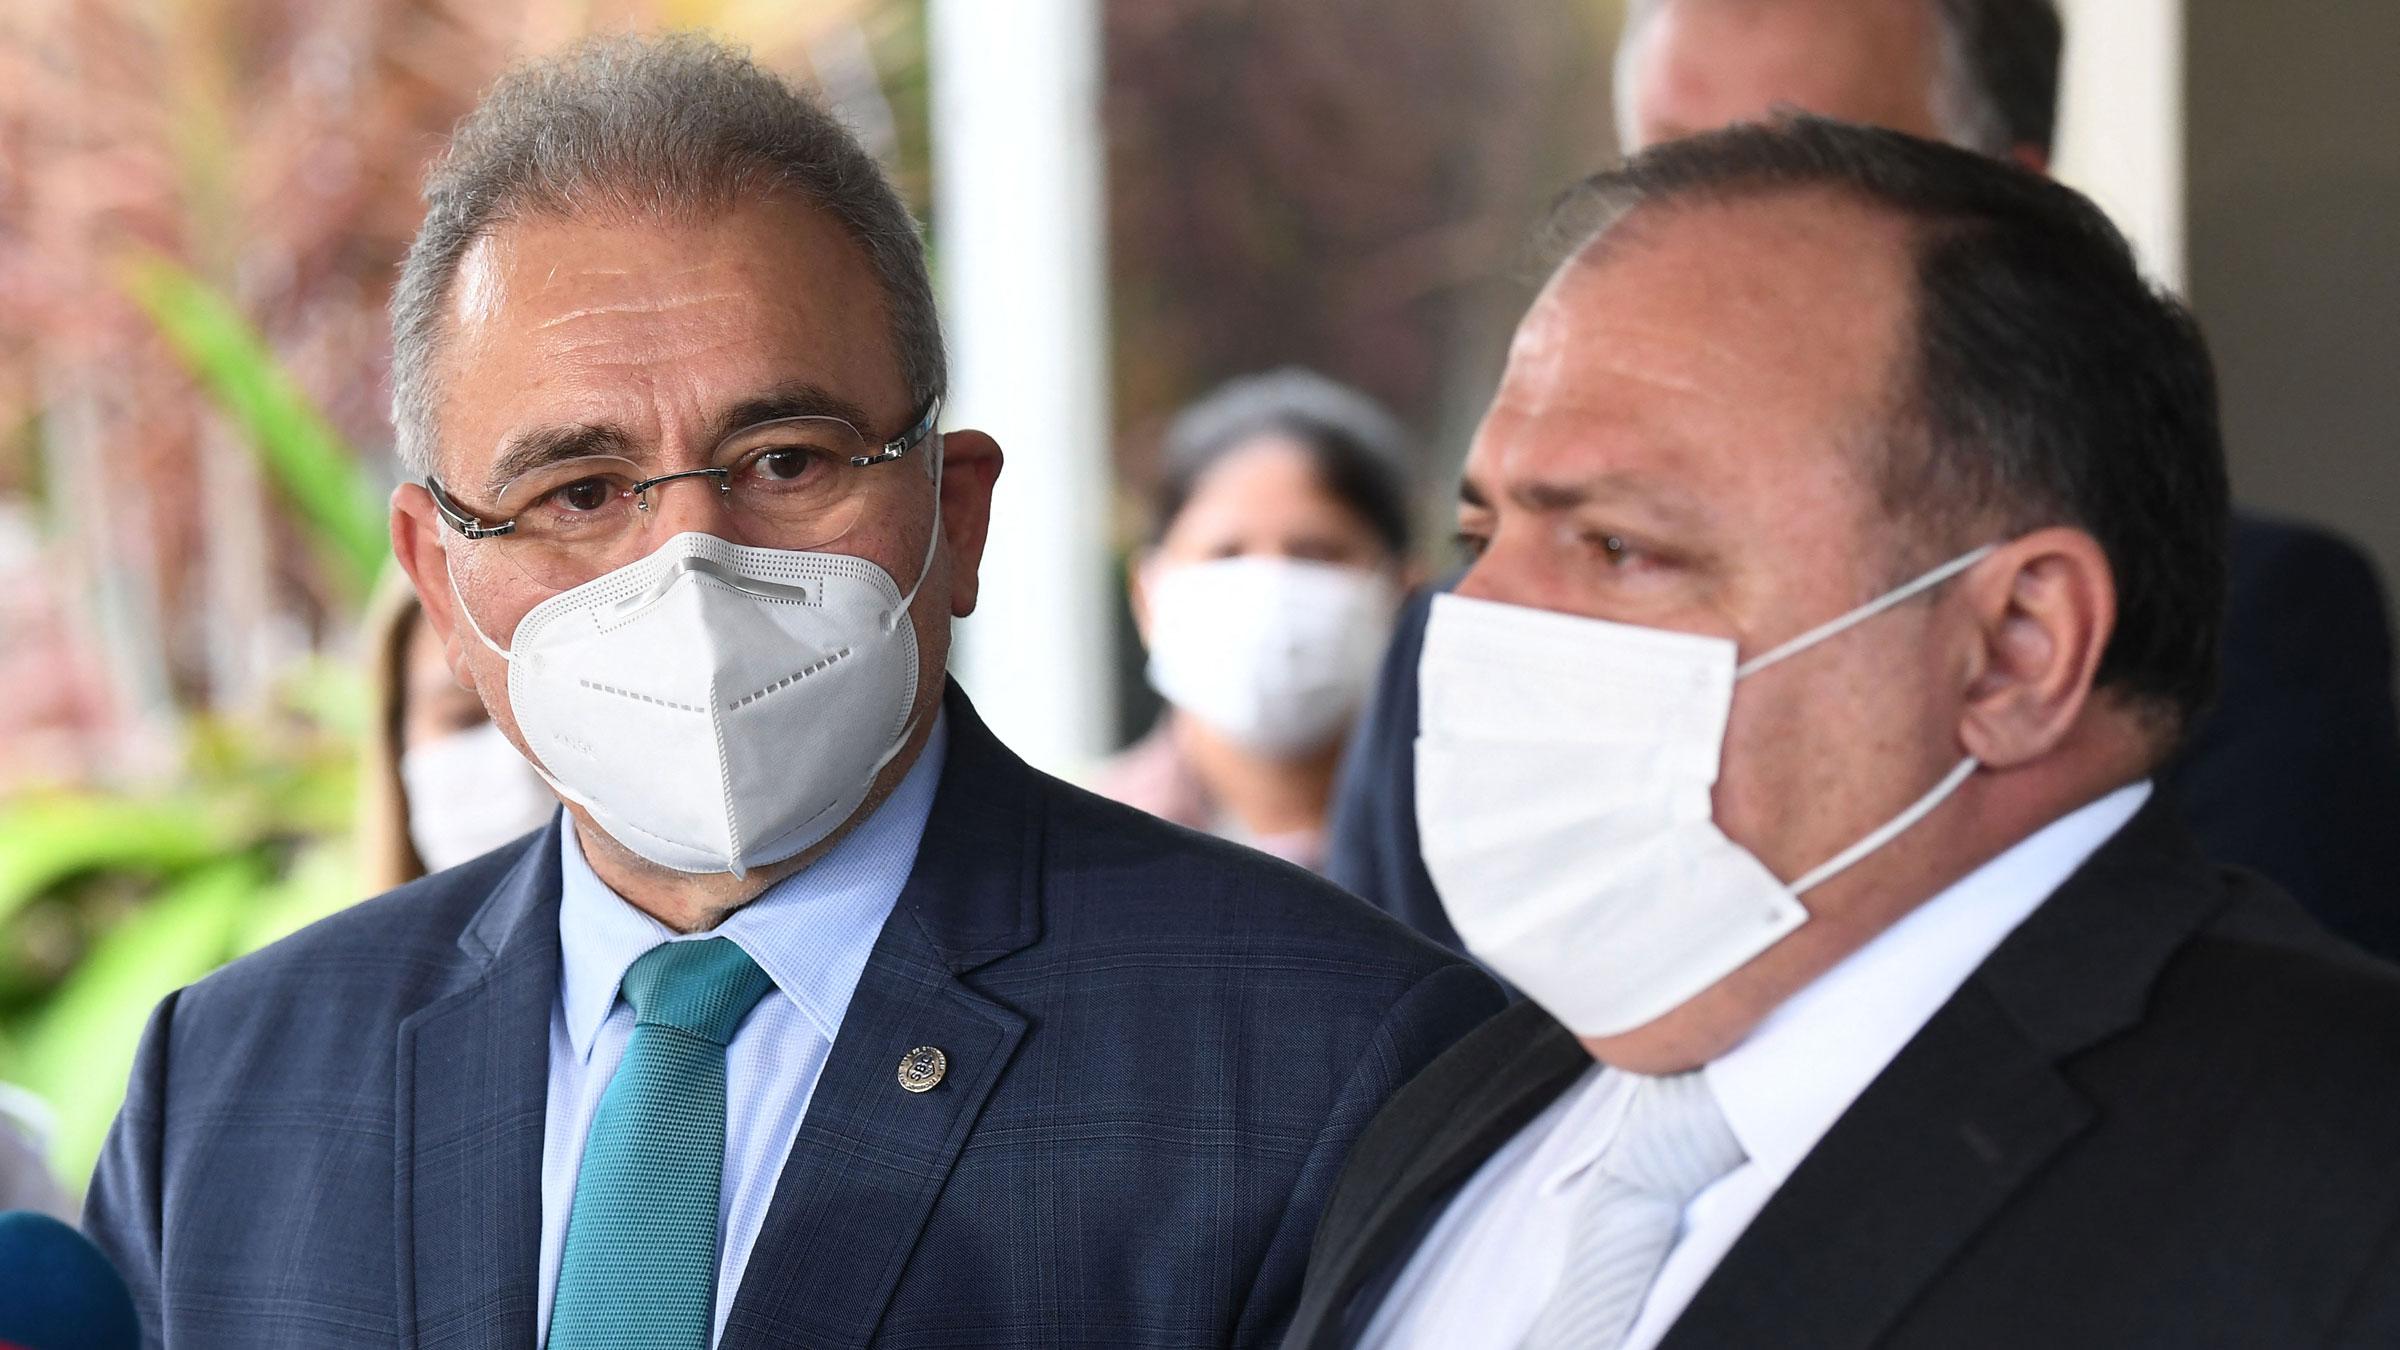 Dr. Marcelo Queiroga, left, succeeded Eduardo Pazuello, right, as Brazil's minister of health on Tuesday.